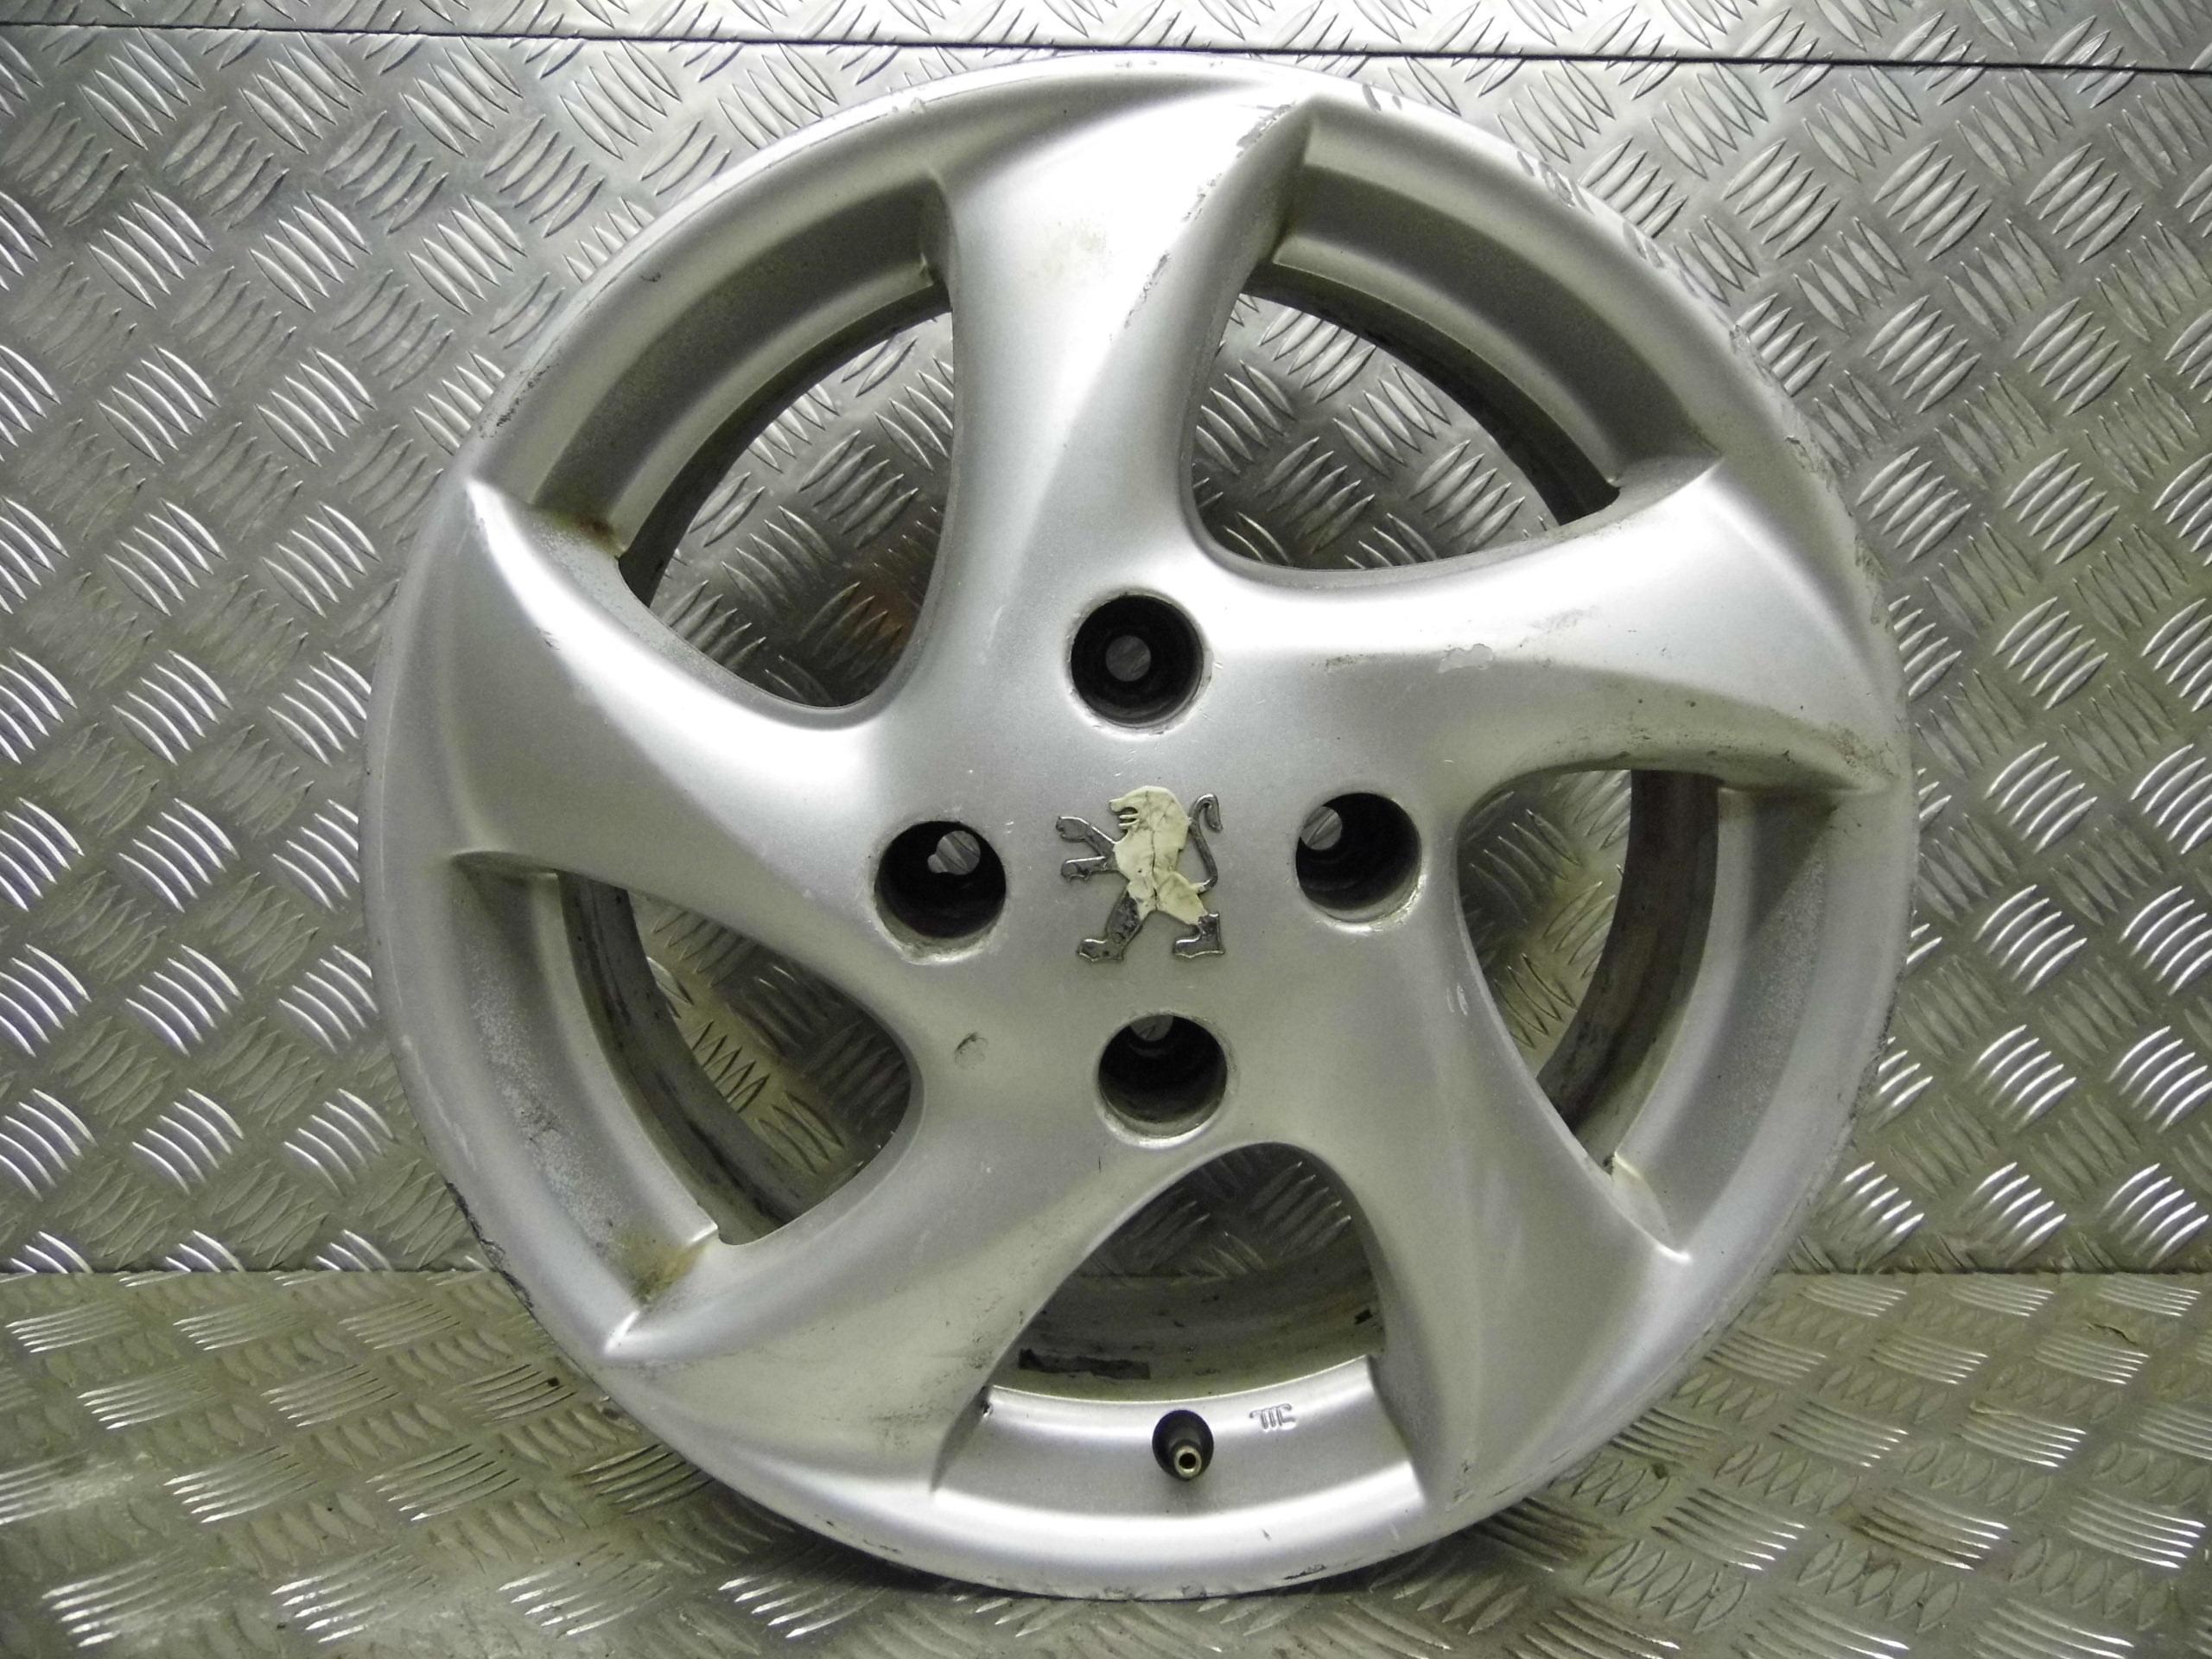 Used 2002  52  Peugeot 206 Estate 6j X 15 Inch 4 Stud Alloy Wheel  1